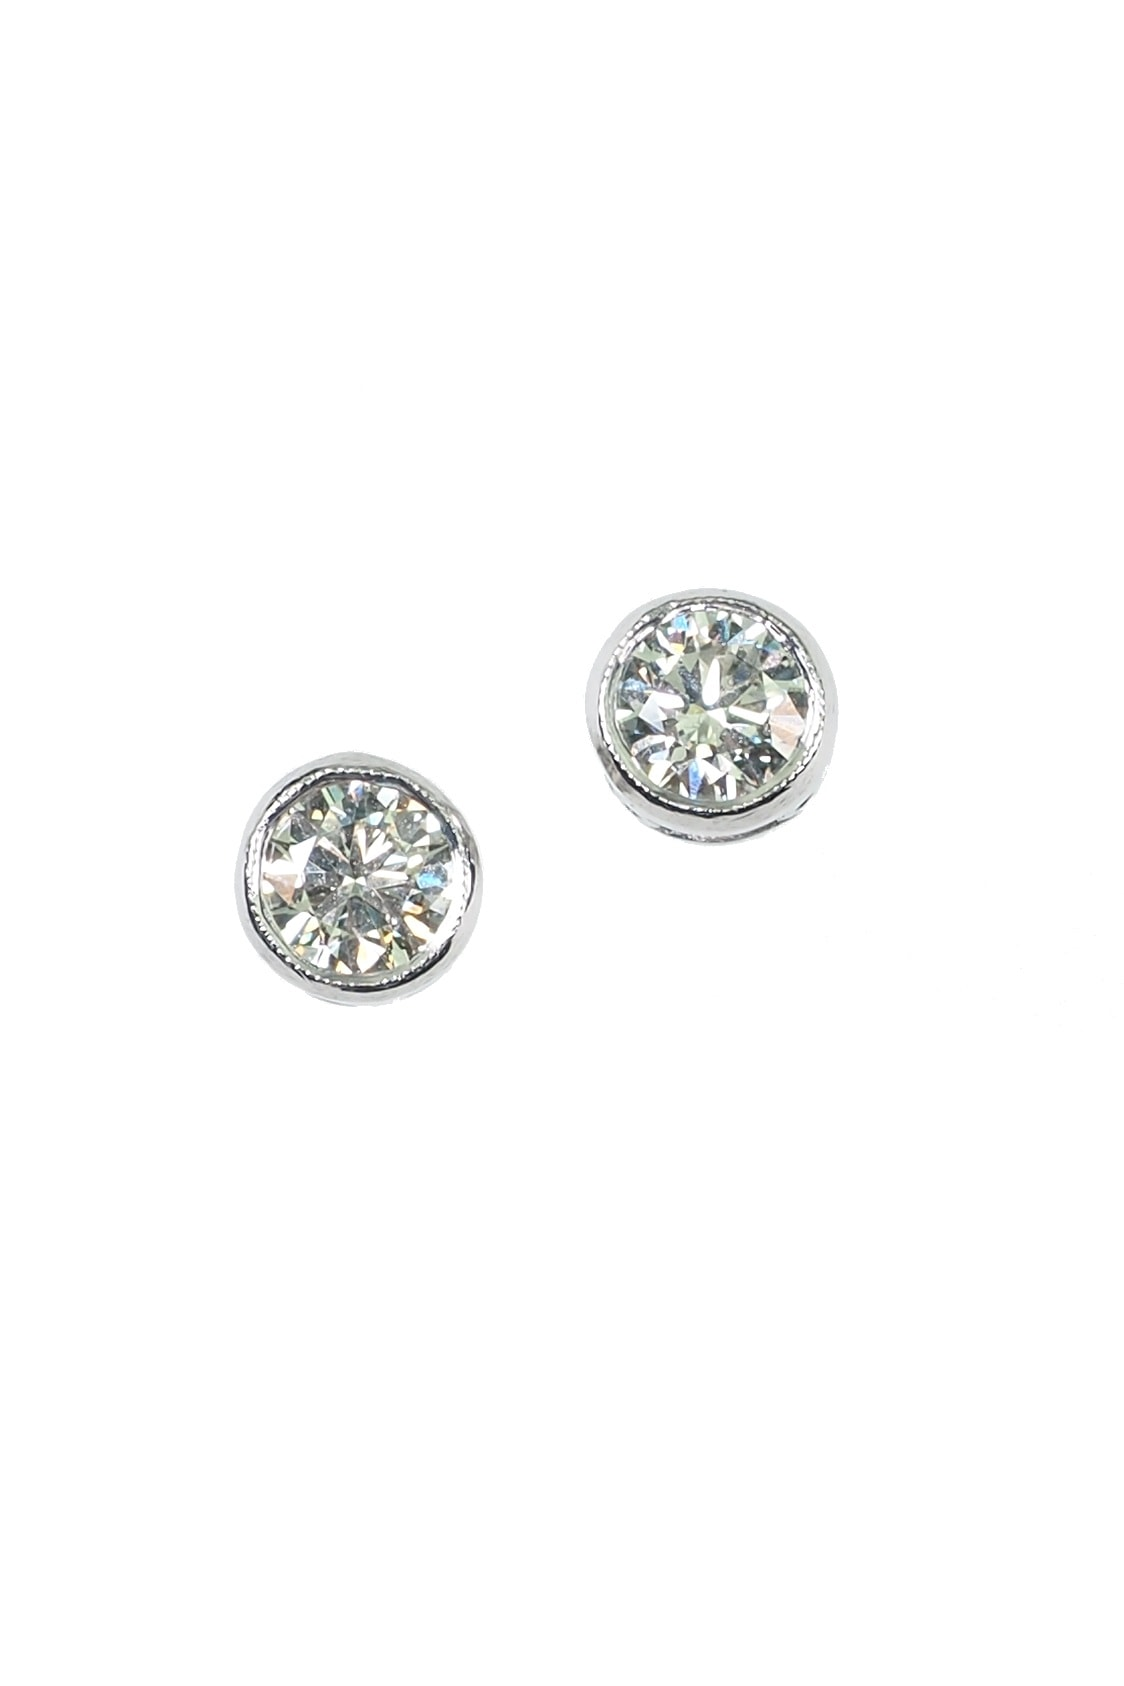 antike-Diamantohrringe-kaufen-2714a